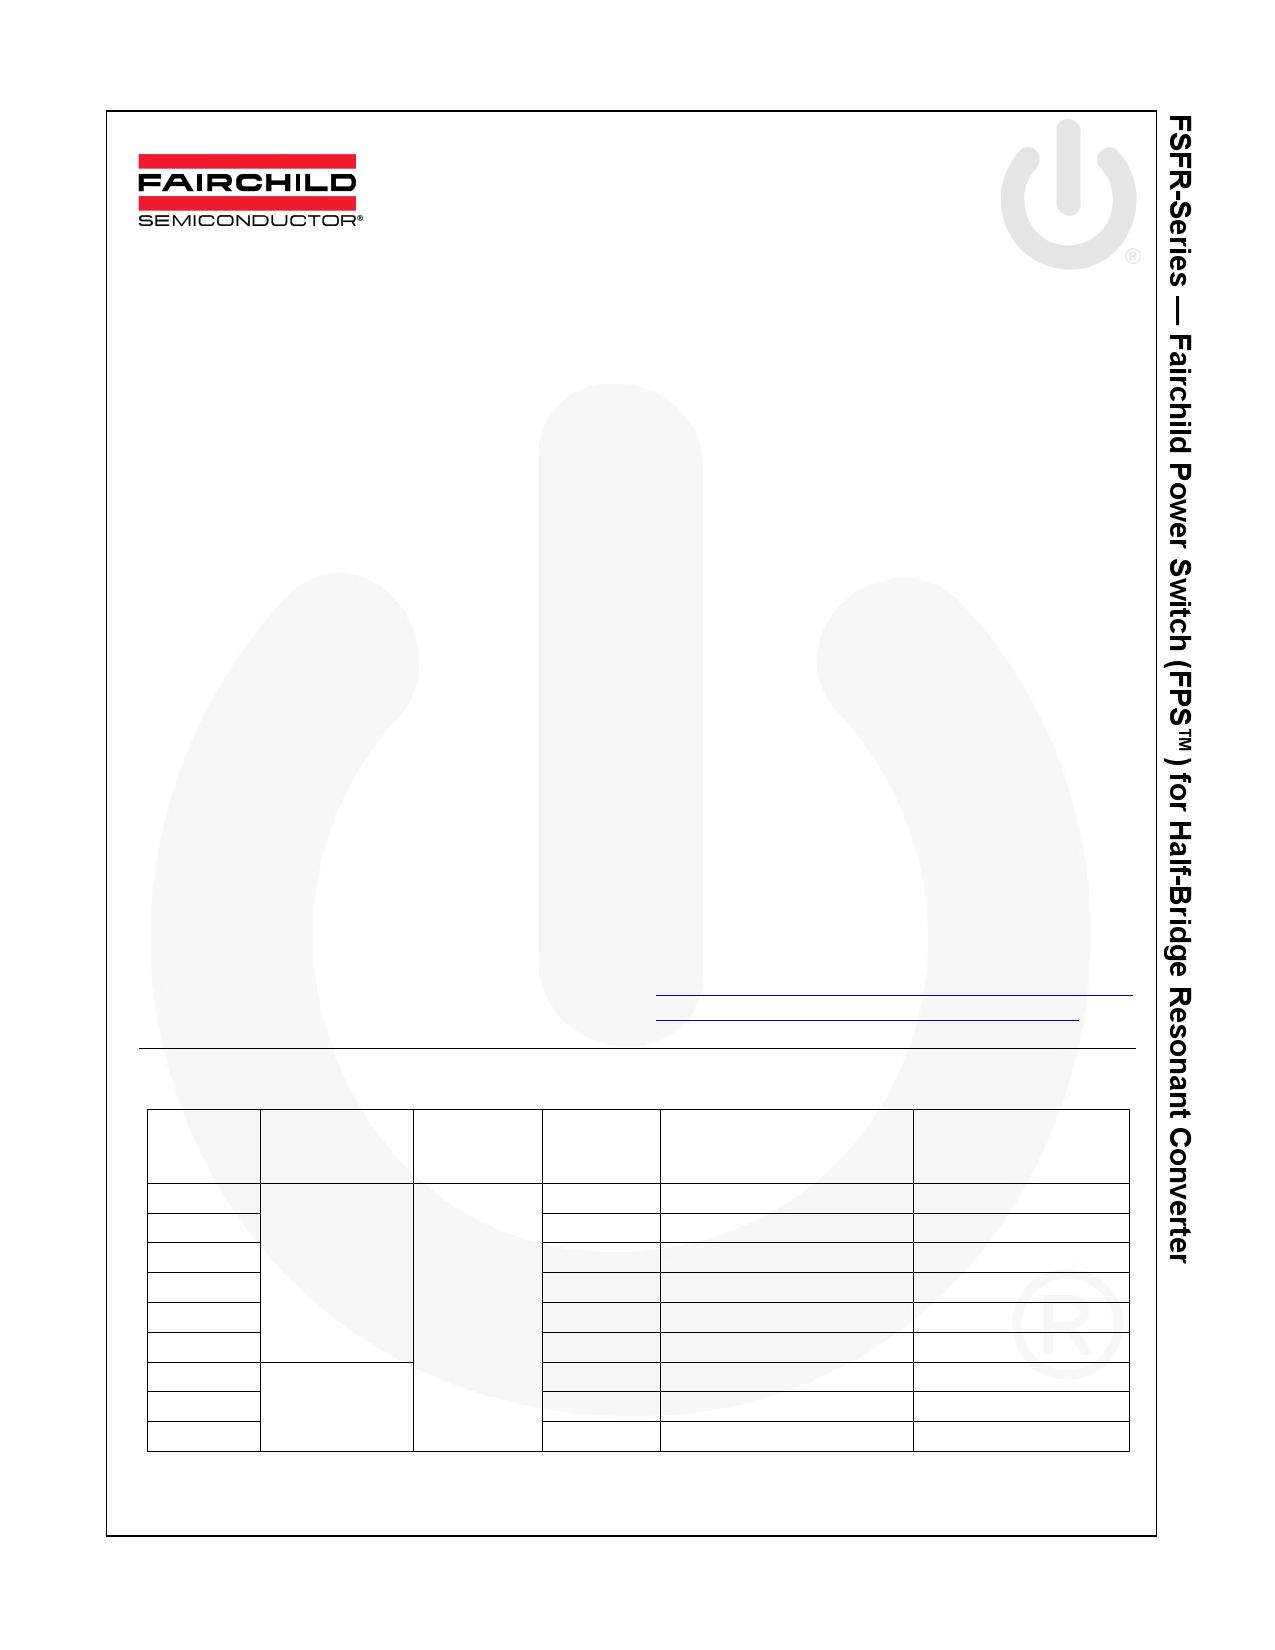 FSFR1800L datasheet